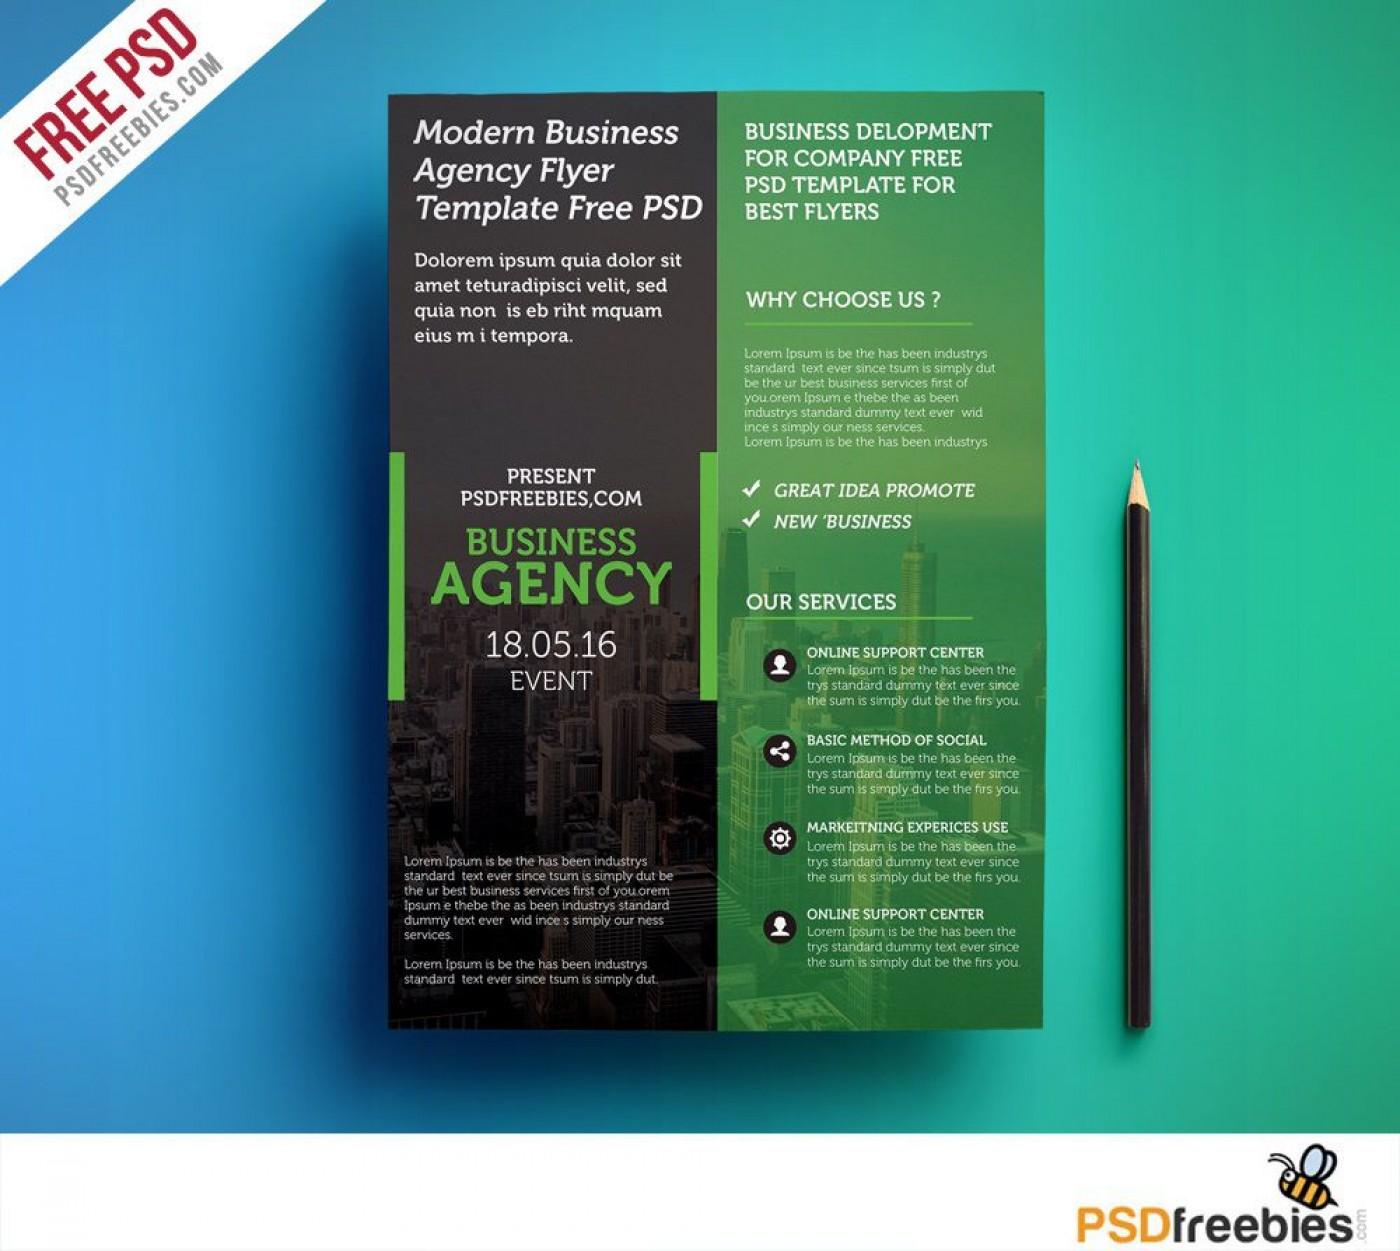 009 Shocking Busines Flyer Template Free Download Image  Photoshop Training Design1400